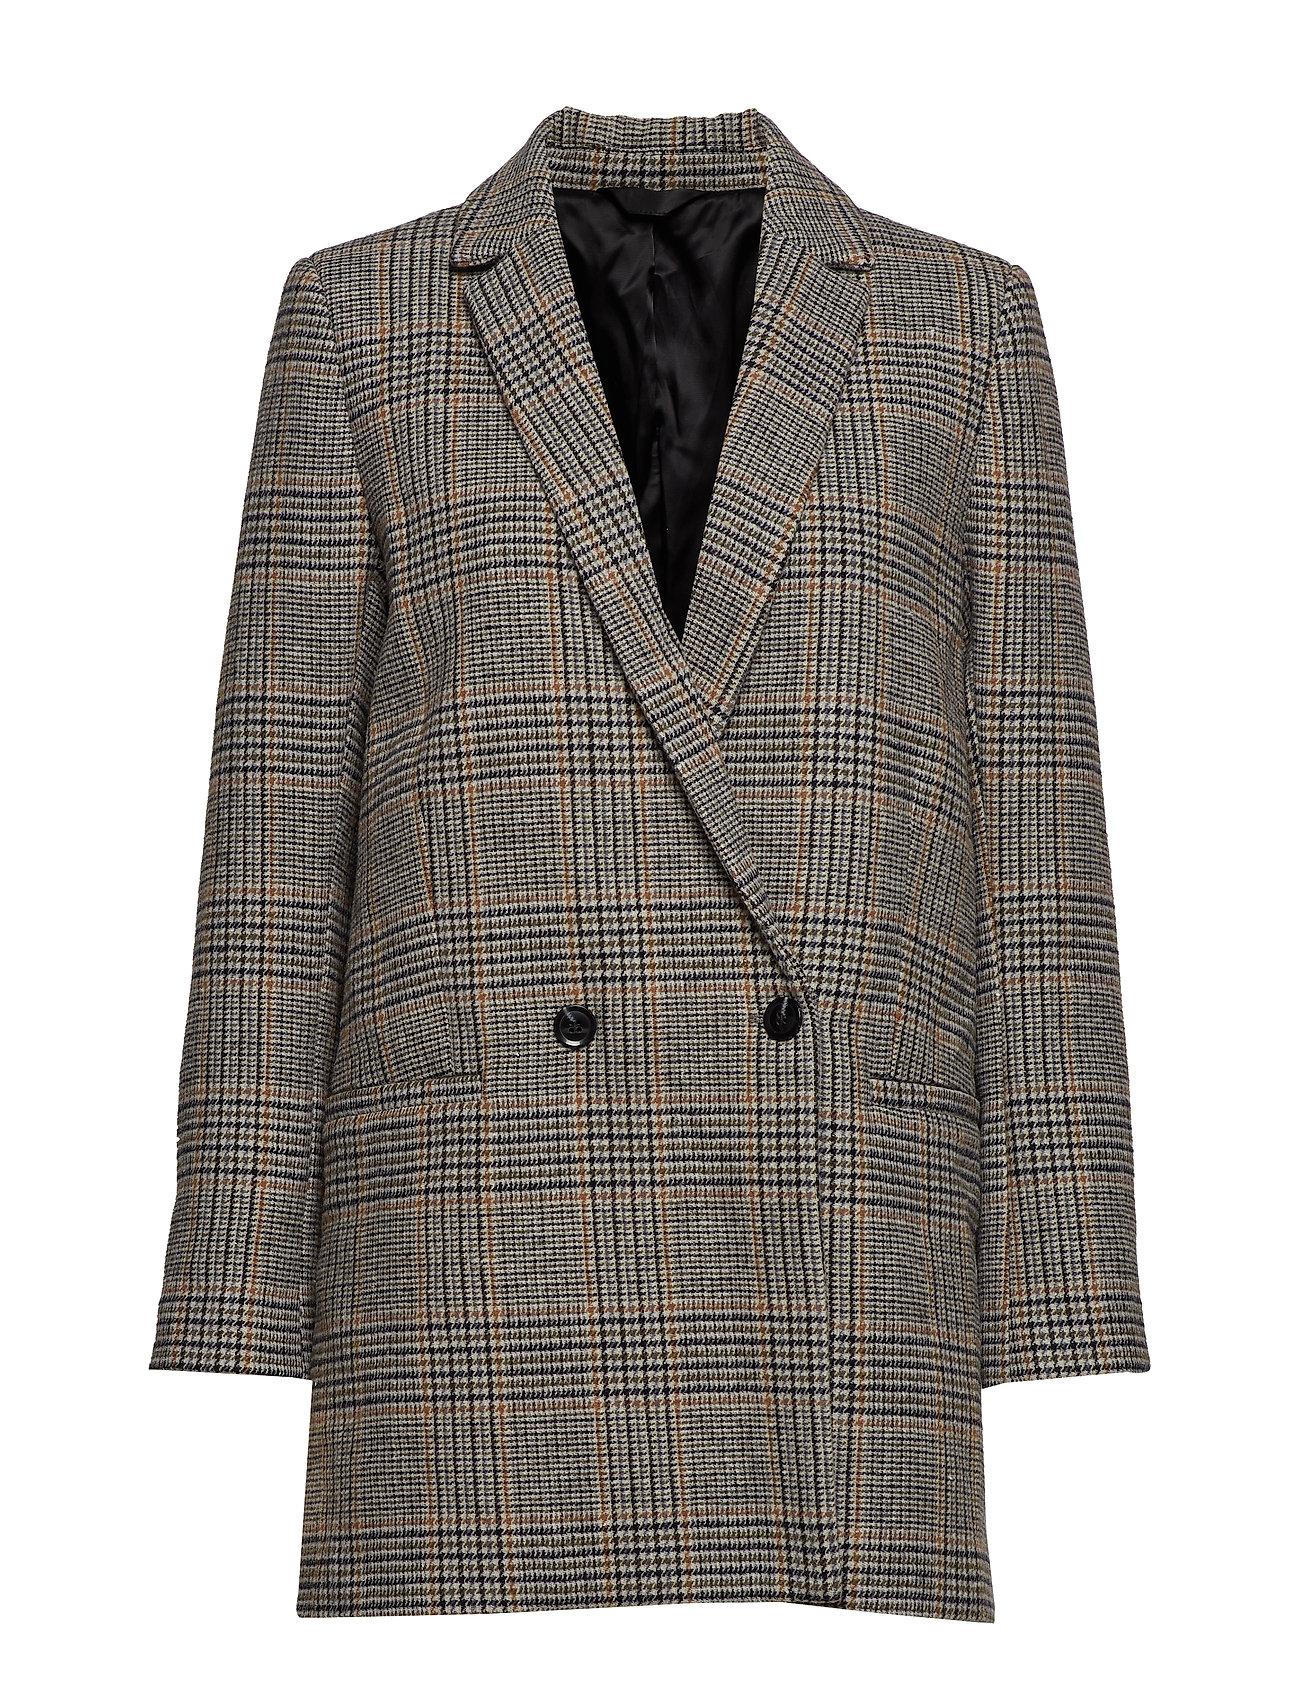 Samsøe & Samsøe Ditte jacket 10153 - CARAMEL CHECK